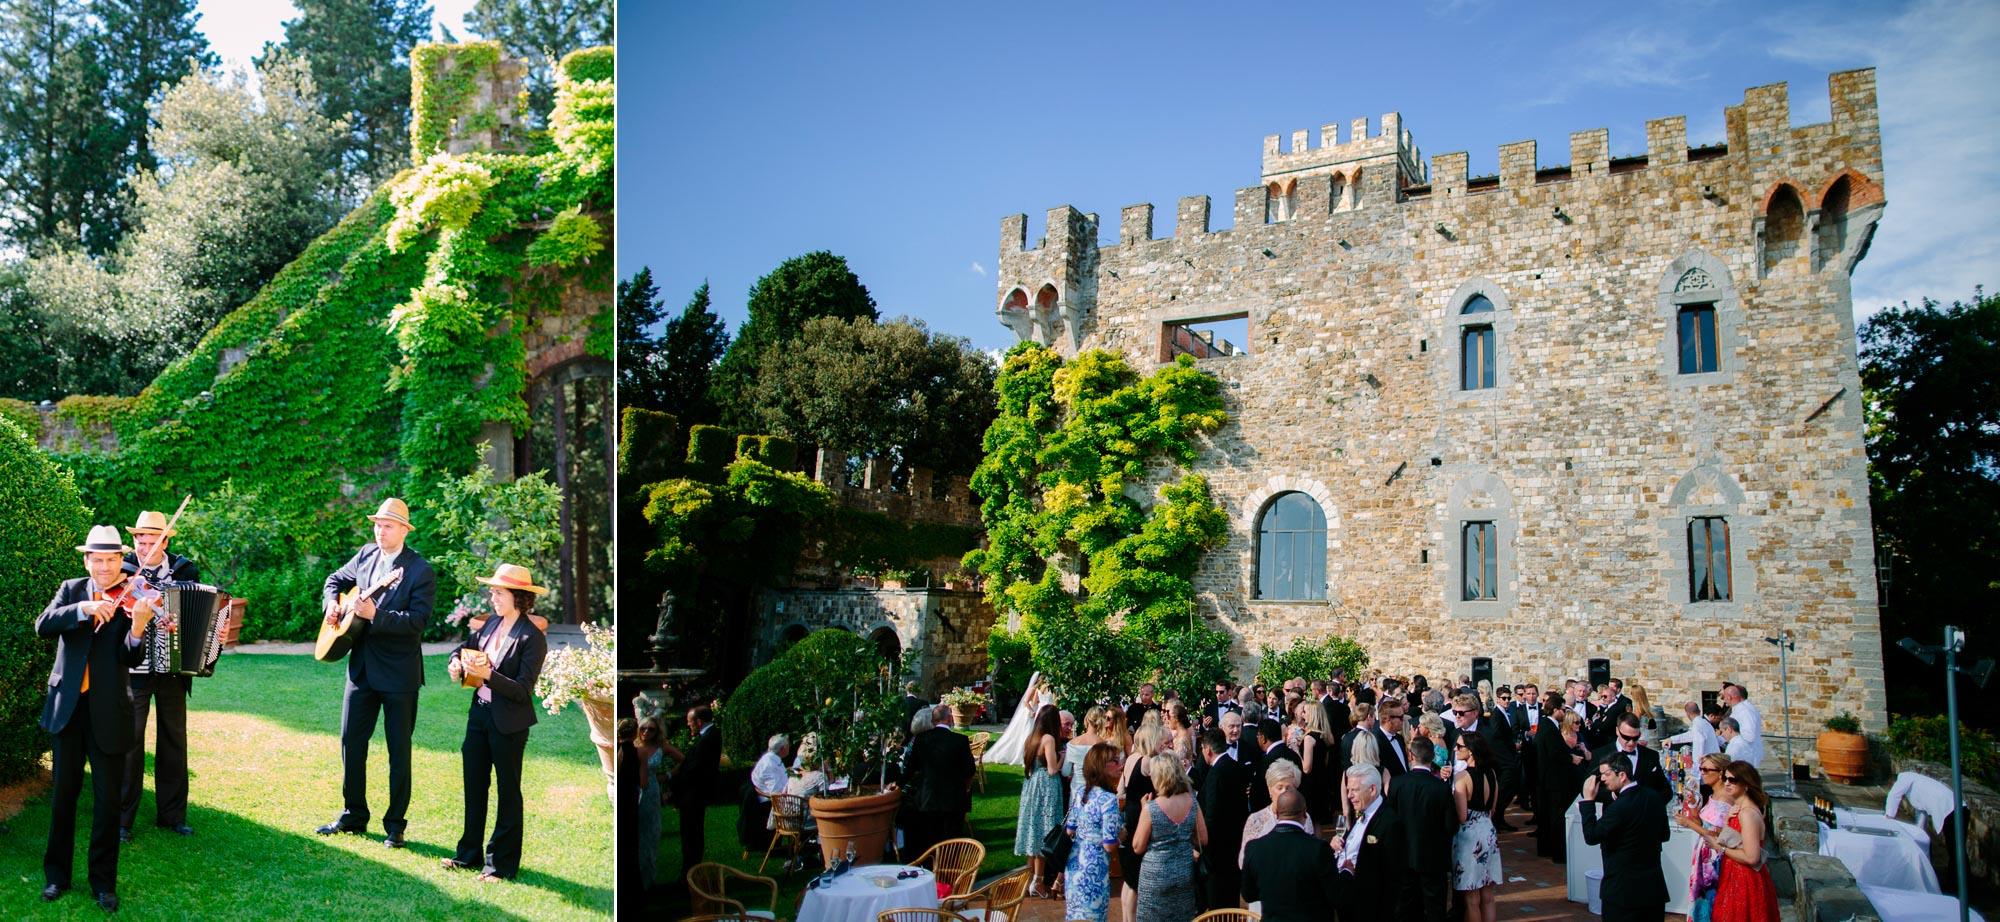 VINCIGLIATA CASTE - FLORENCE - WEDDING-29.jpg